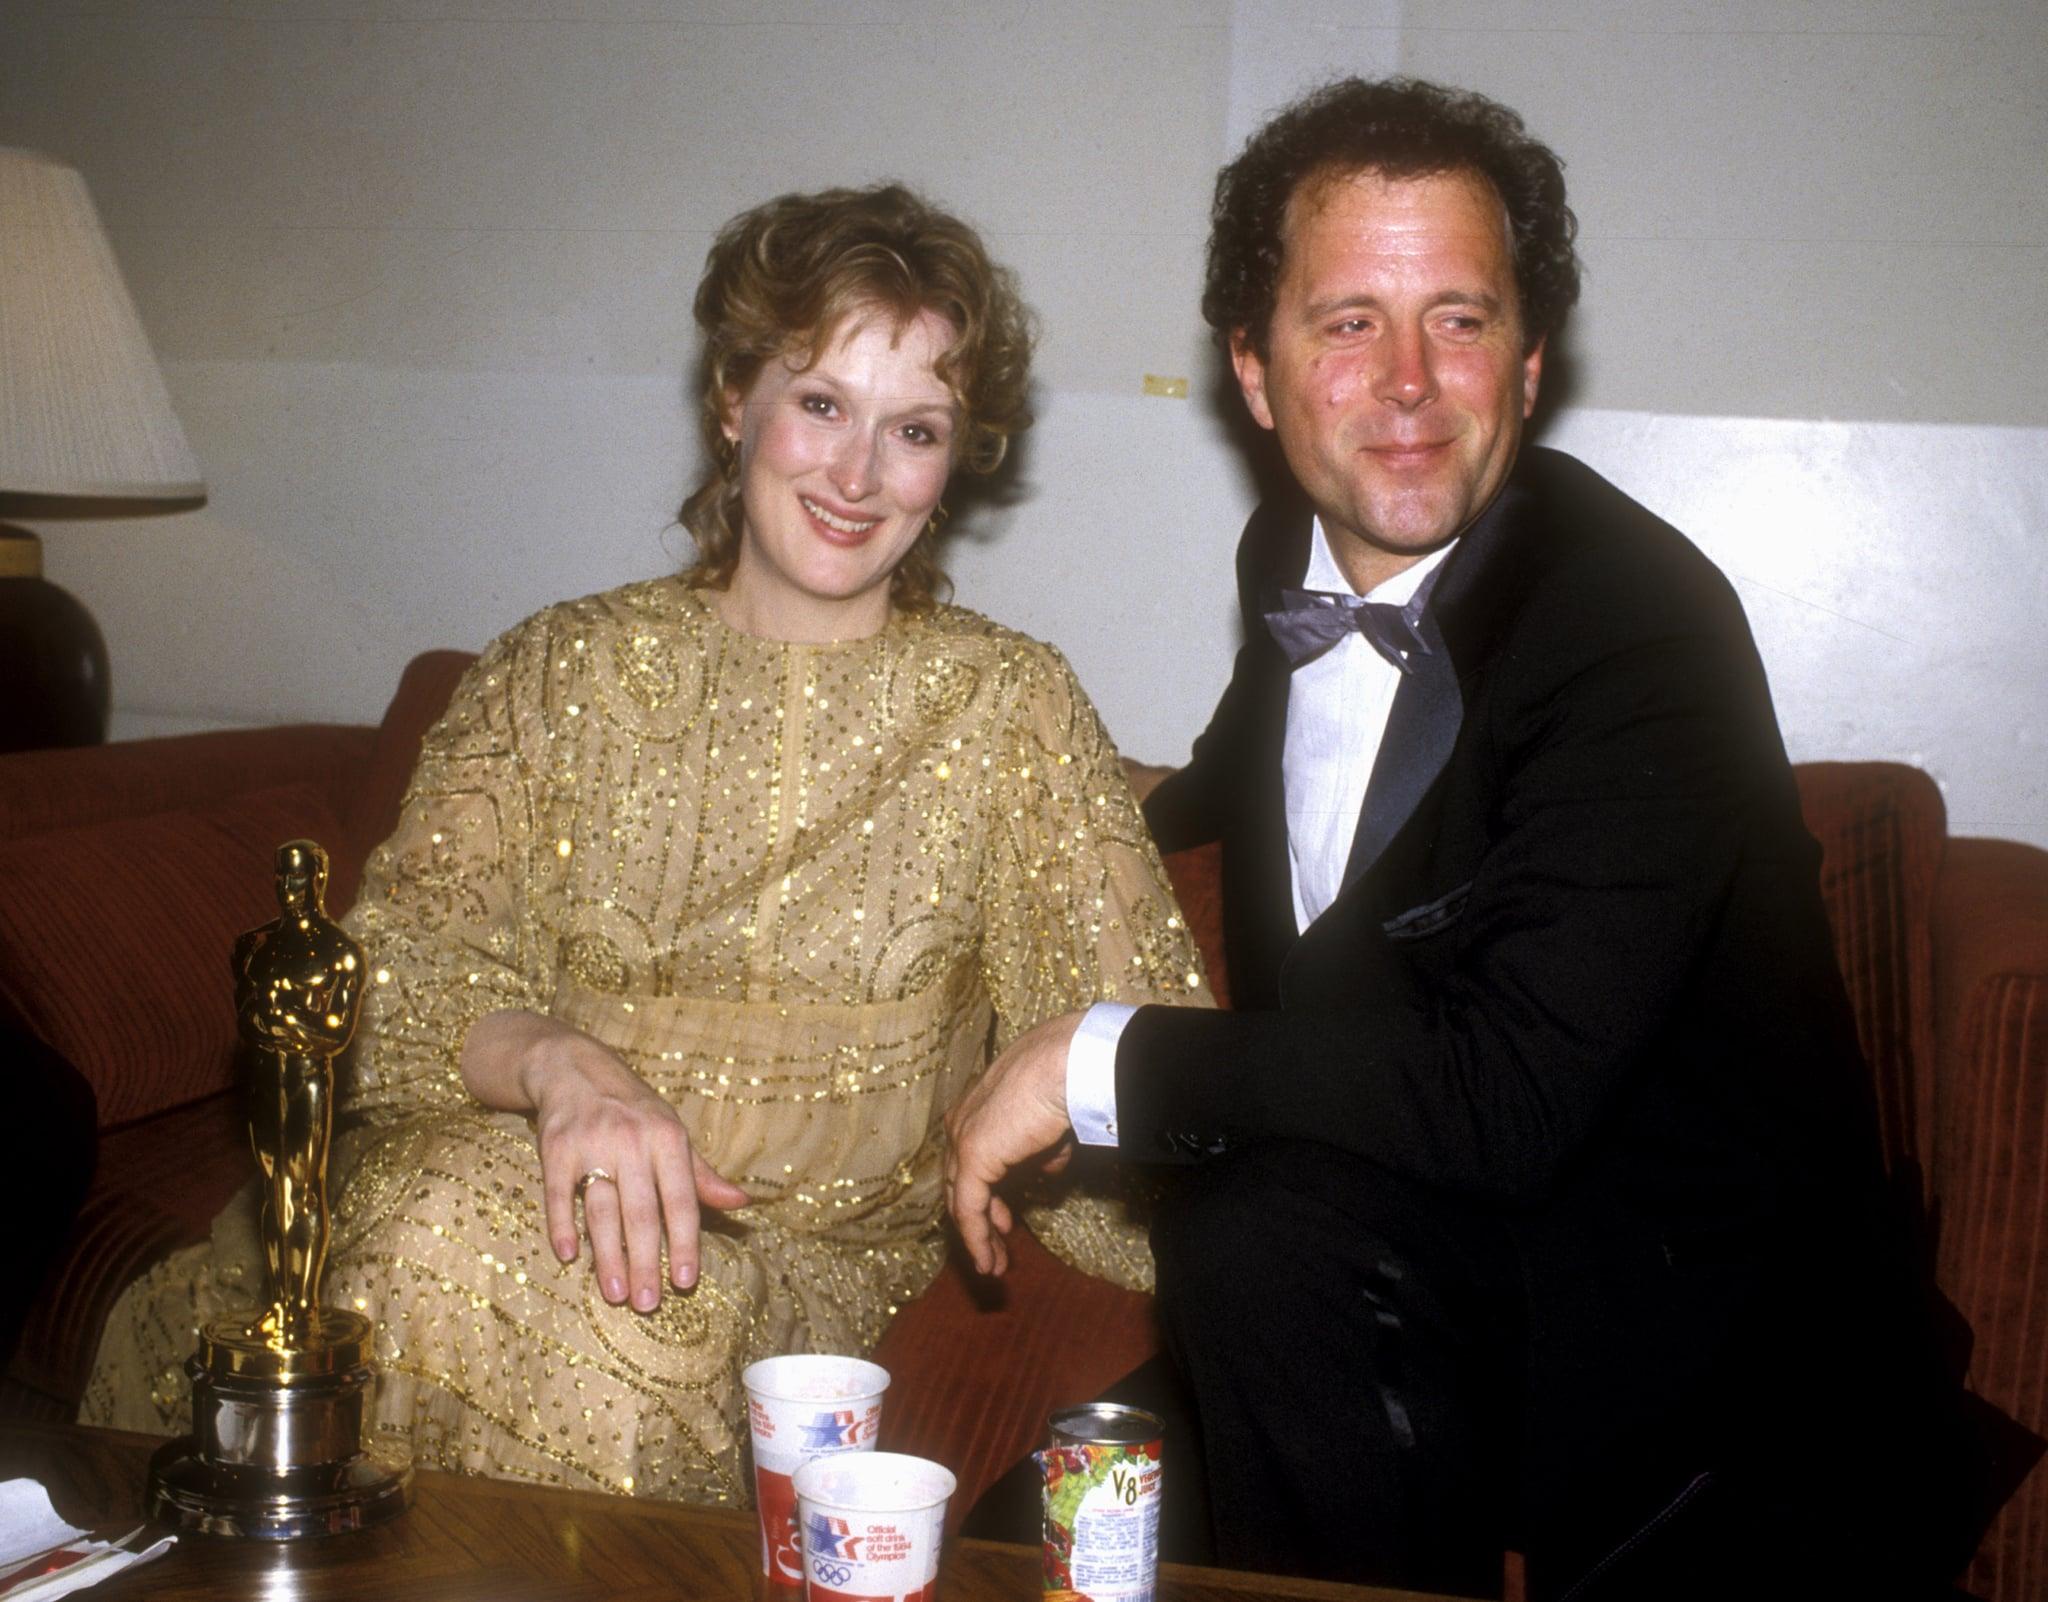 How Did Meryl Streep and Don Gummer Meet? | POPSUGAR Celebrity